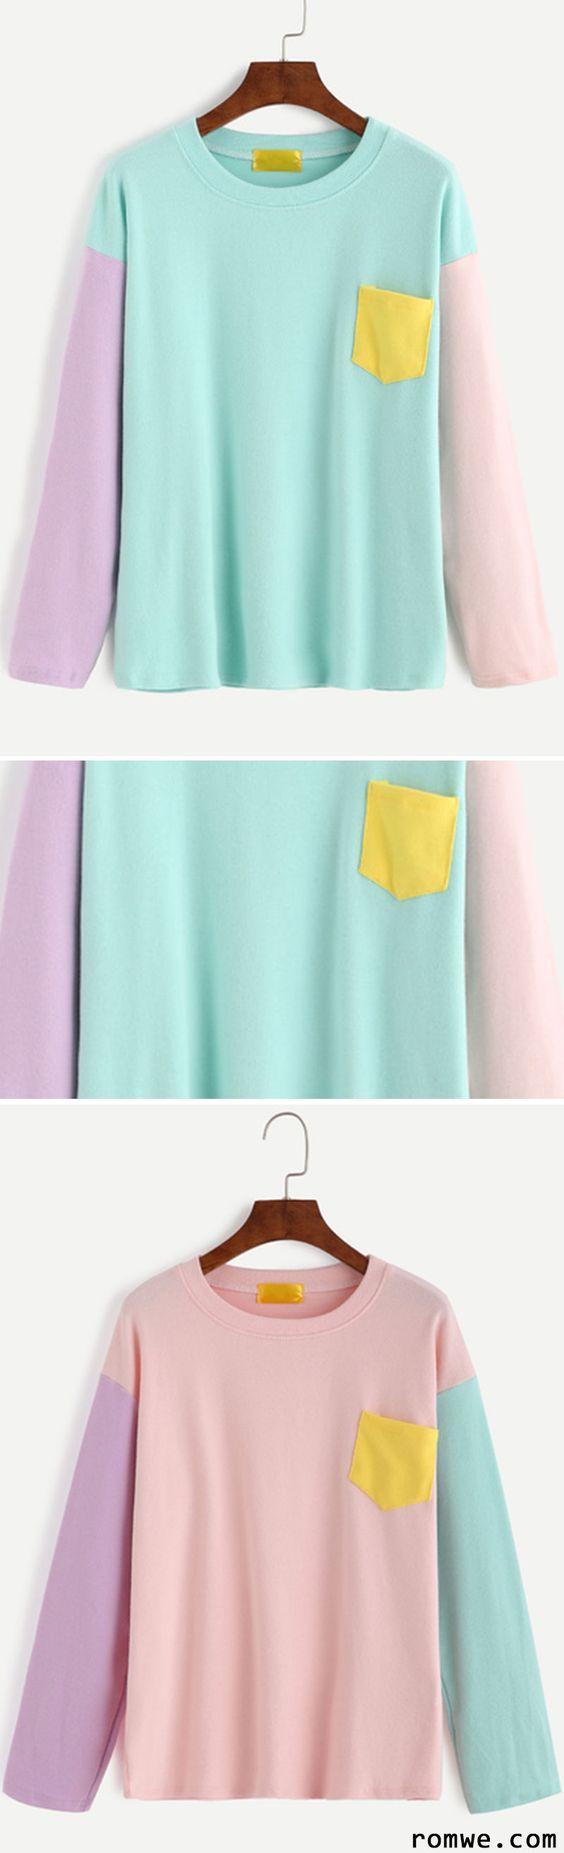 Color Block Dropped Shoulder Seam Patch Pocket T-shirt